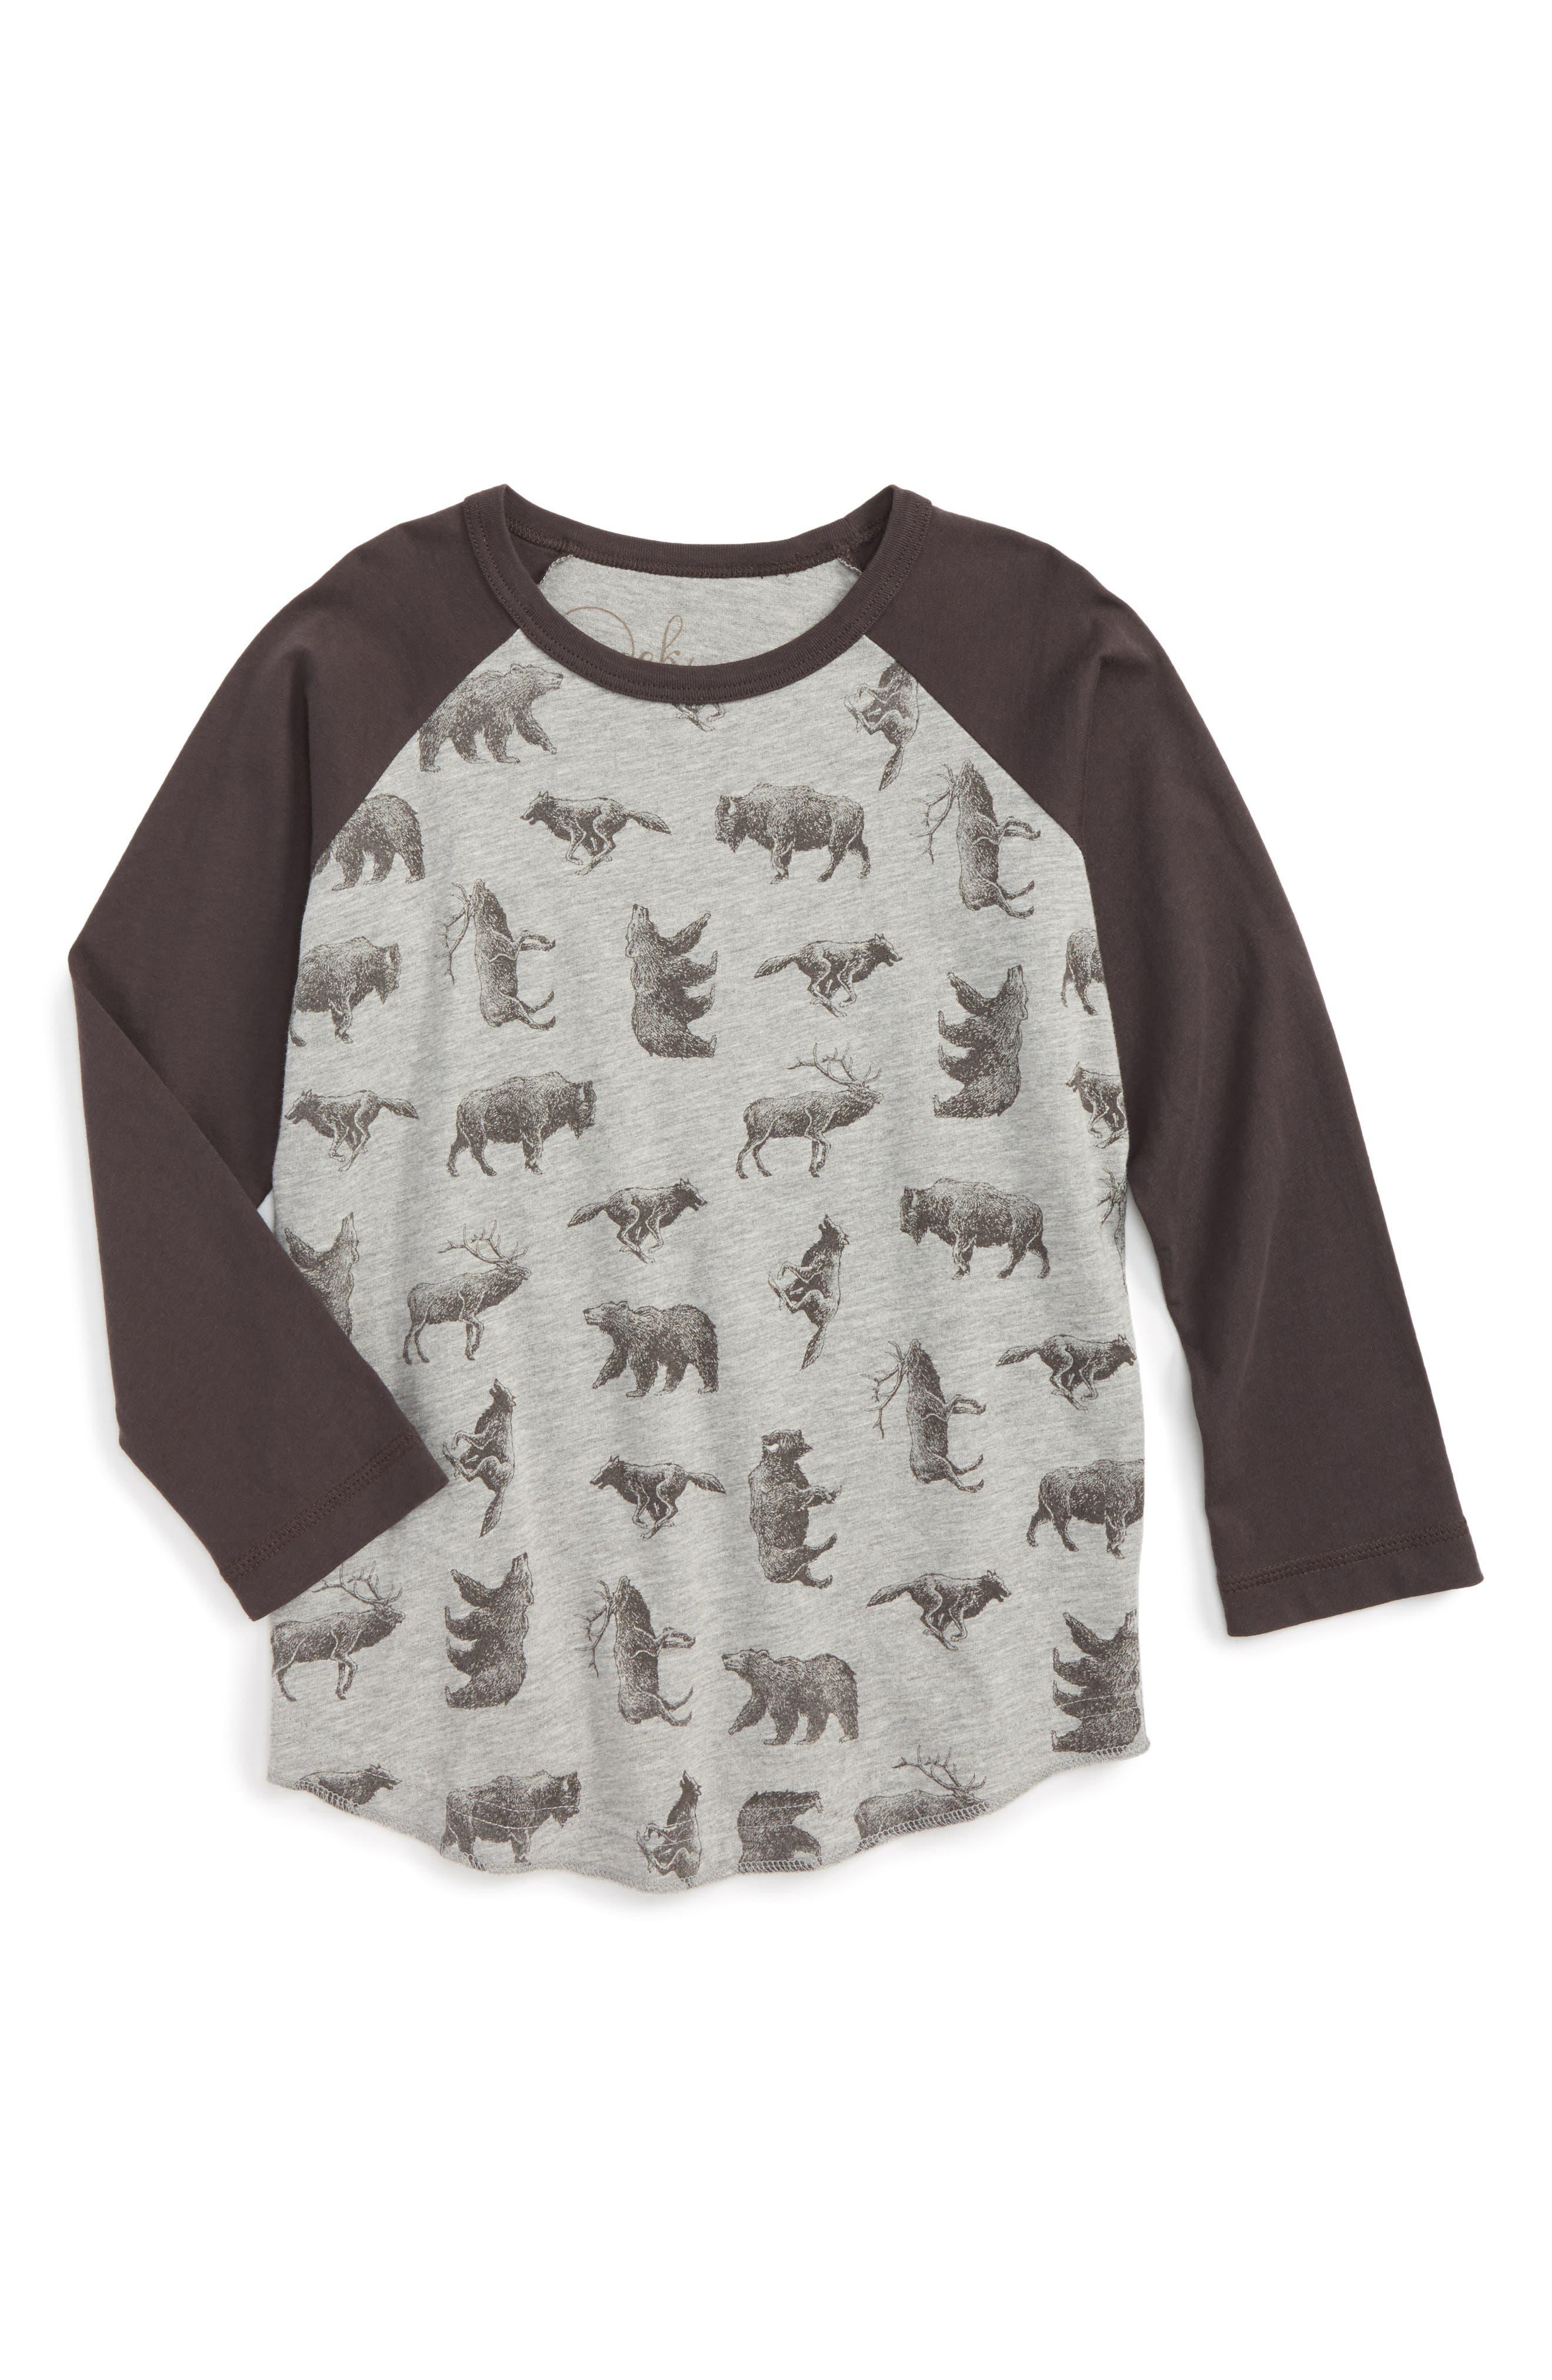 Main Image - Peek Animal Print Raglan T-Shirt (Toddler Boys, Little Boys & Big Boys)